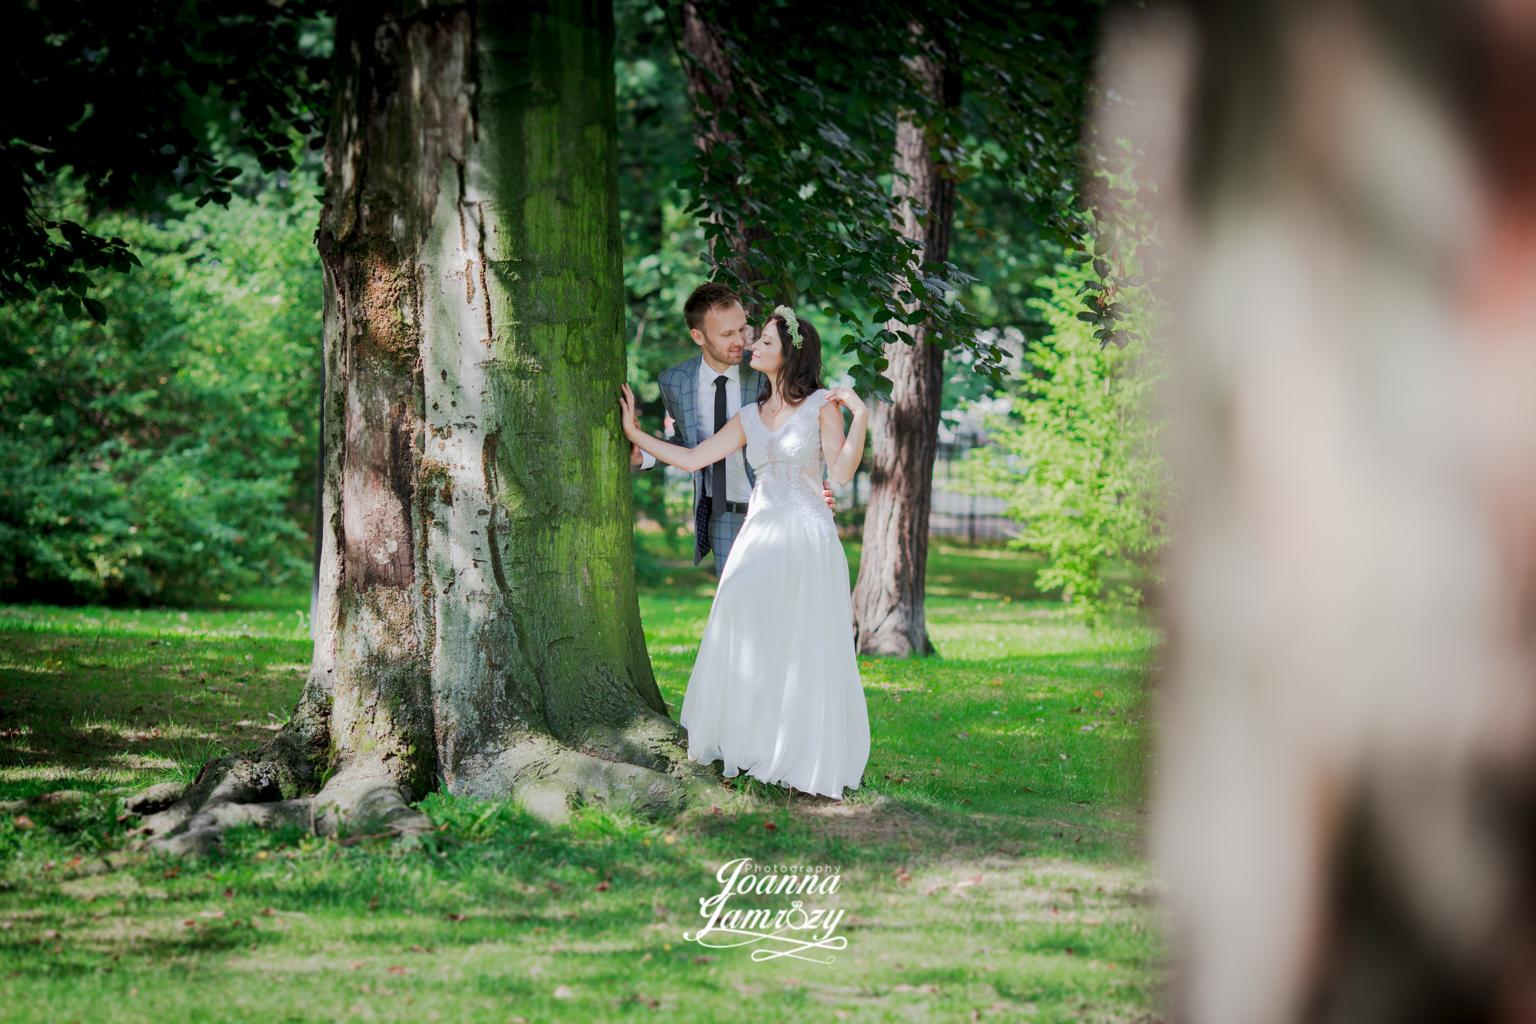 JOANNA JAMROZY WEDDINGS